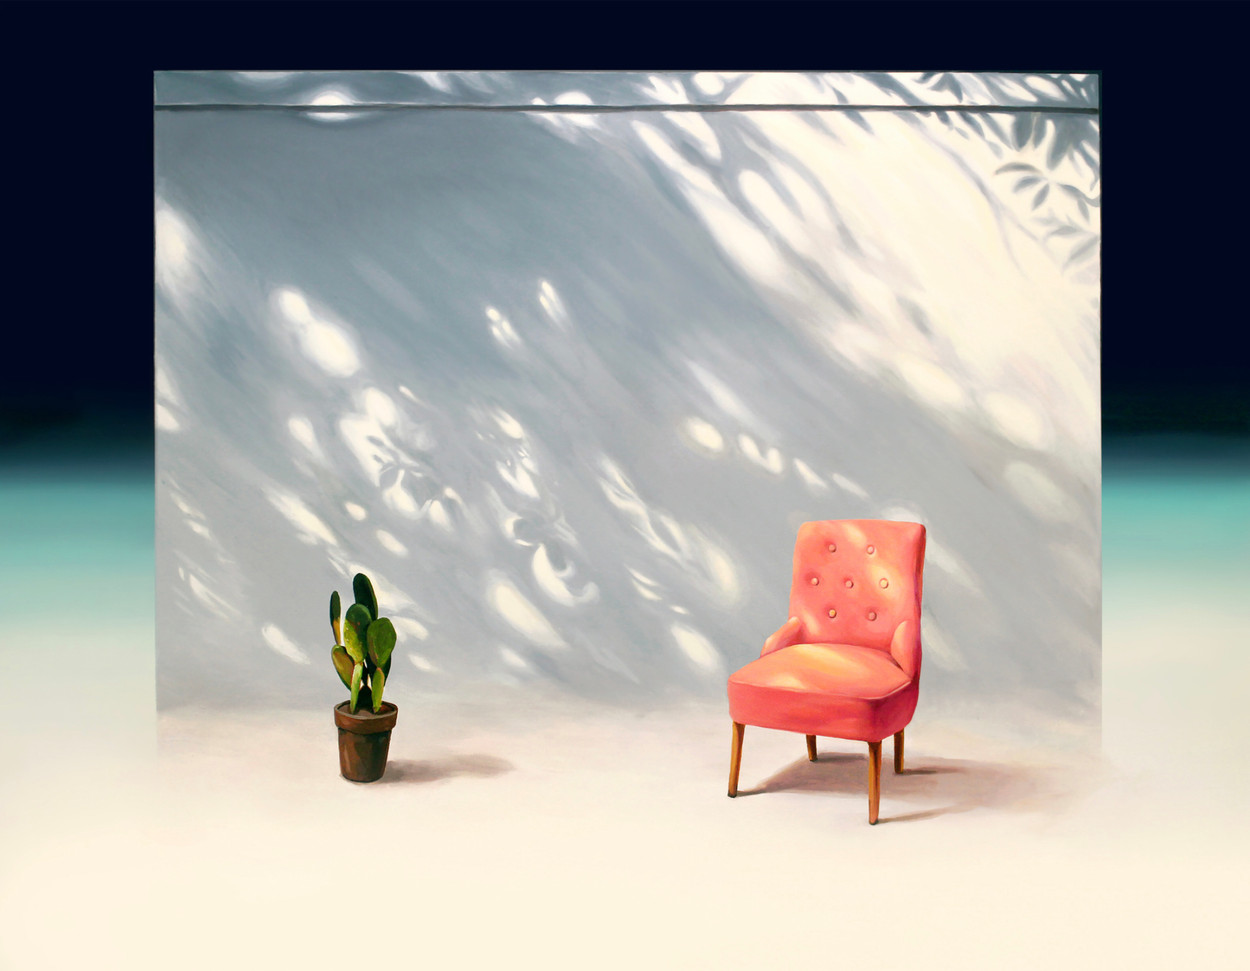 Rest chair (2018)